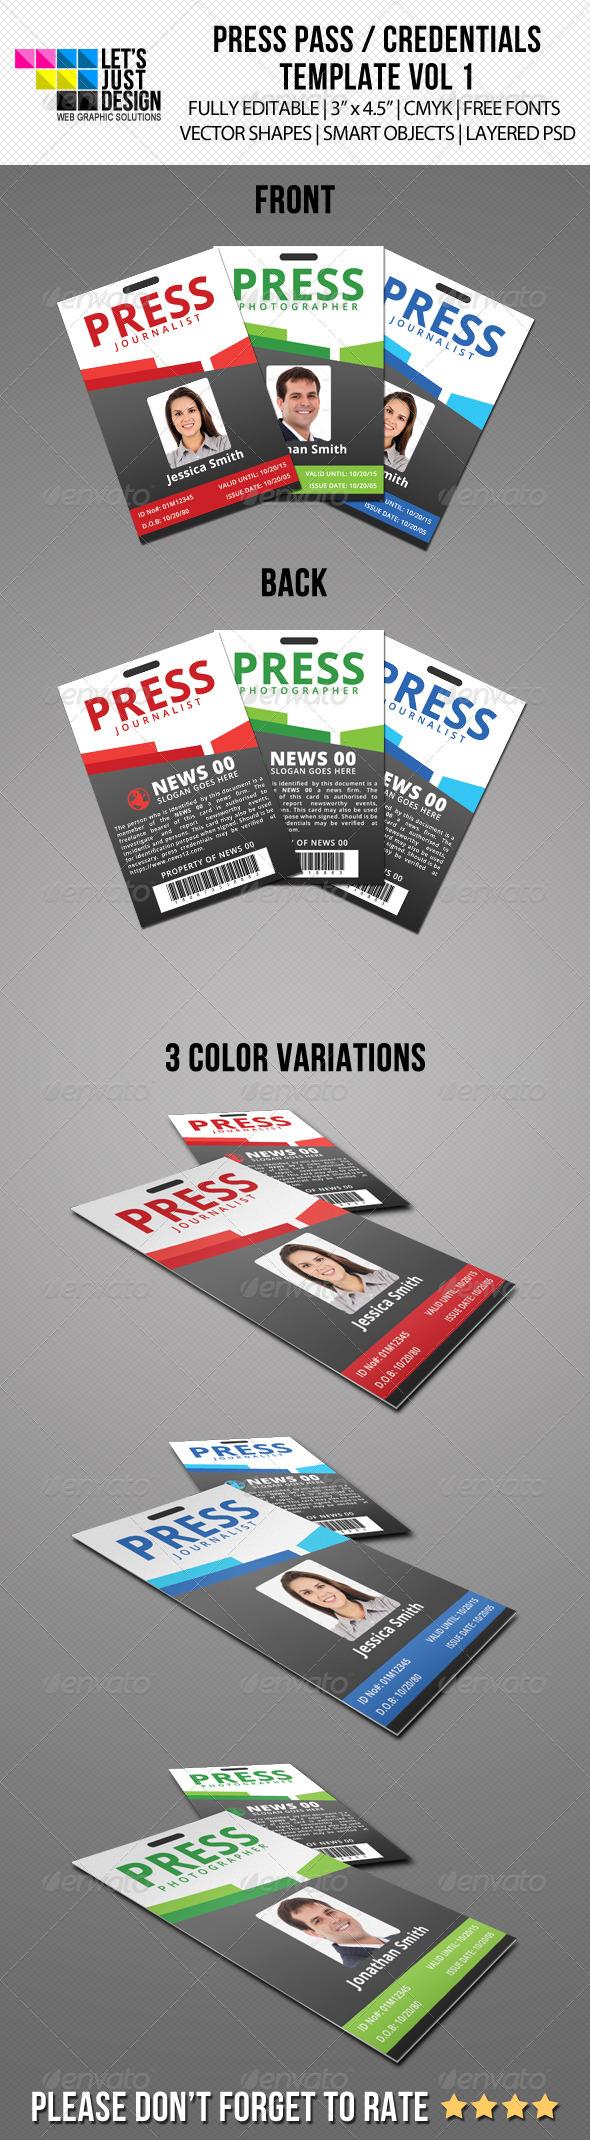 press pass credentials template vol 1 graphicriver. Black Bedroom Furniture Sets. Home Design Ideas